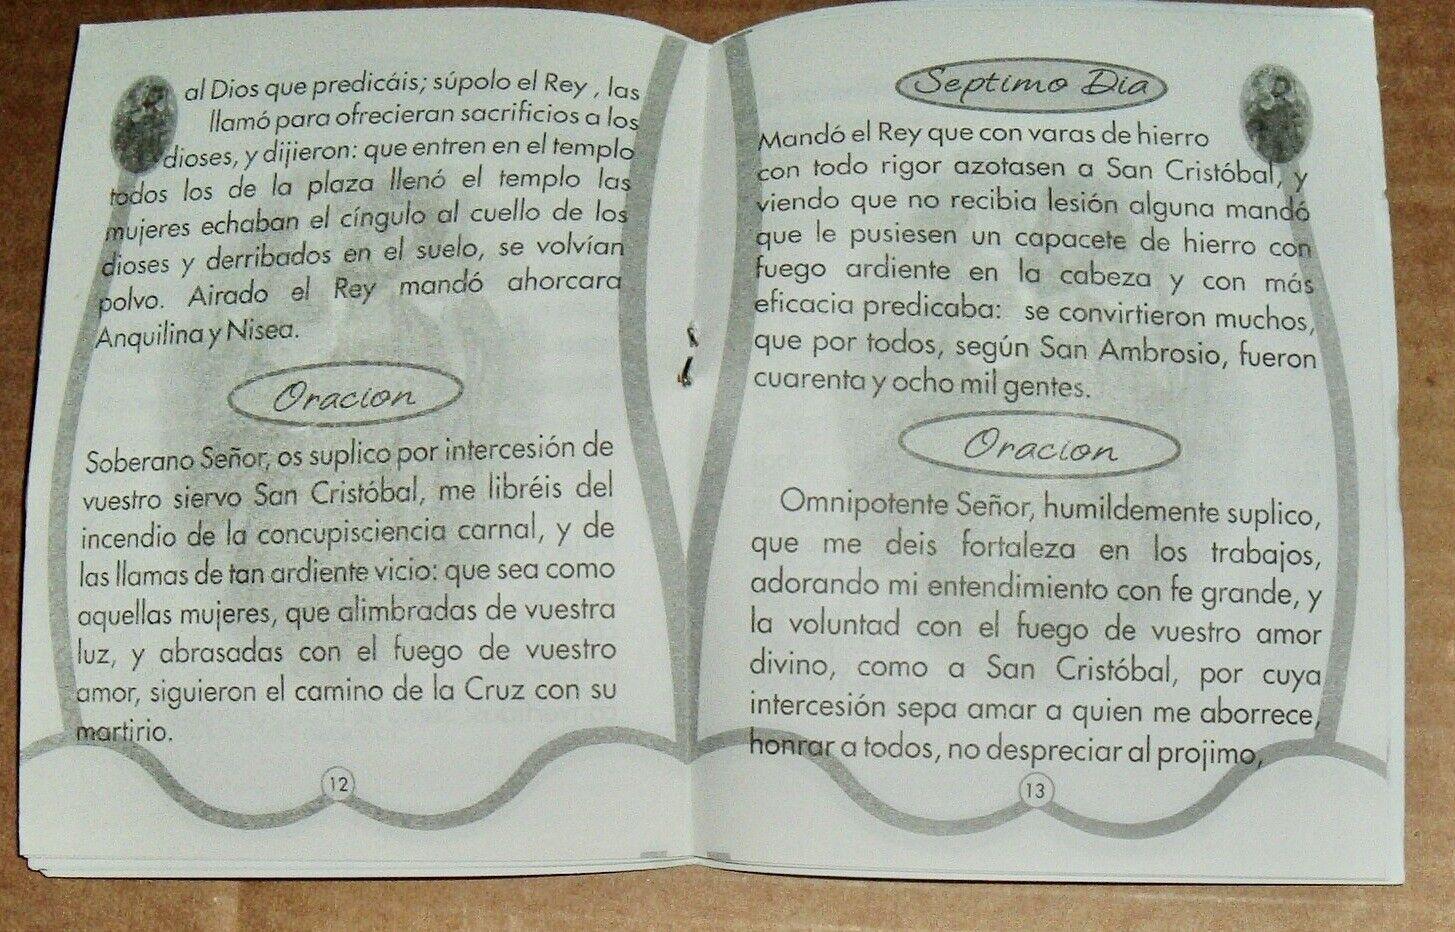 3--SPANISH NOVENA SAN CRISTOBAL PAMPHLETS 23 Pages ESPIRITUAL CHRISTOPHER - $8.50